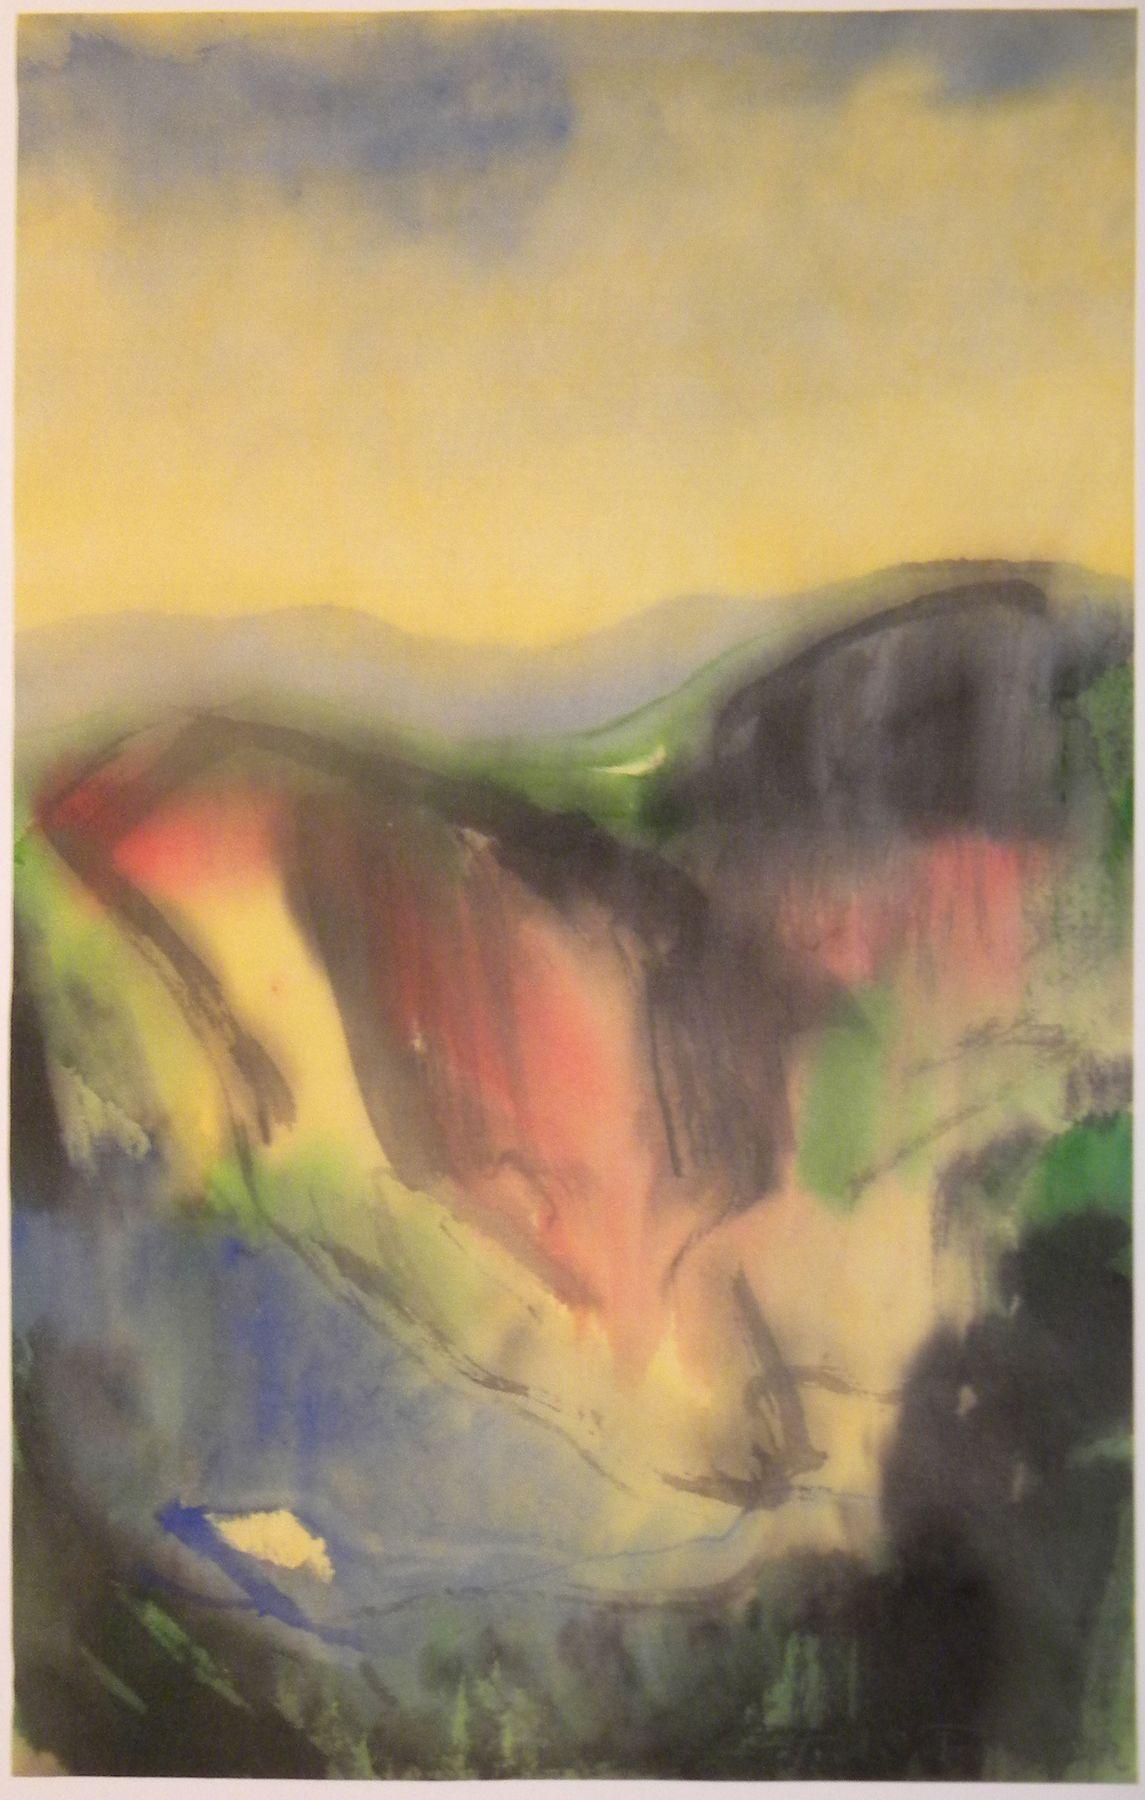 Fulvio Testa, Untitled 9, 2012    Watercolor on paper 15 x 11 7/8 inches